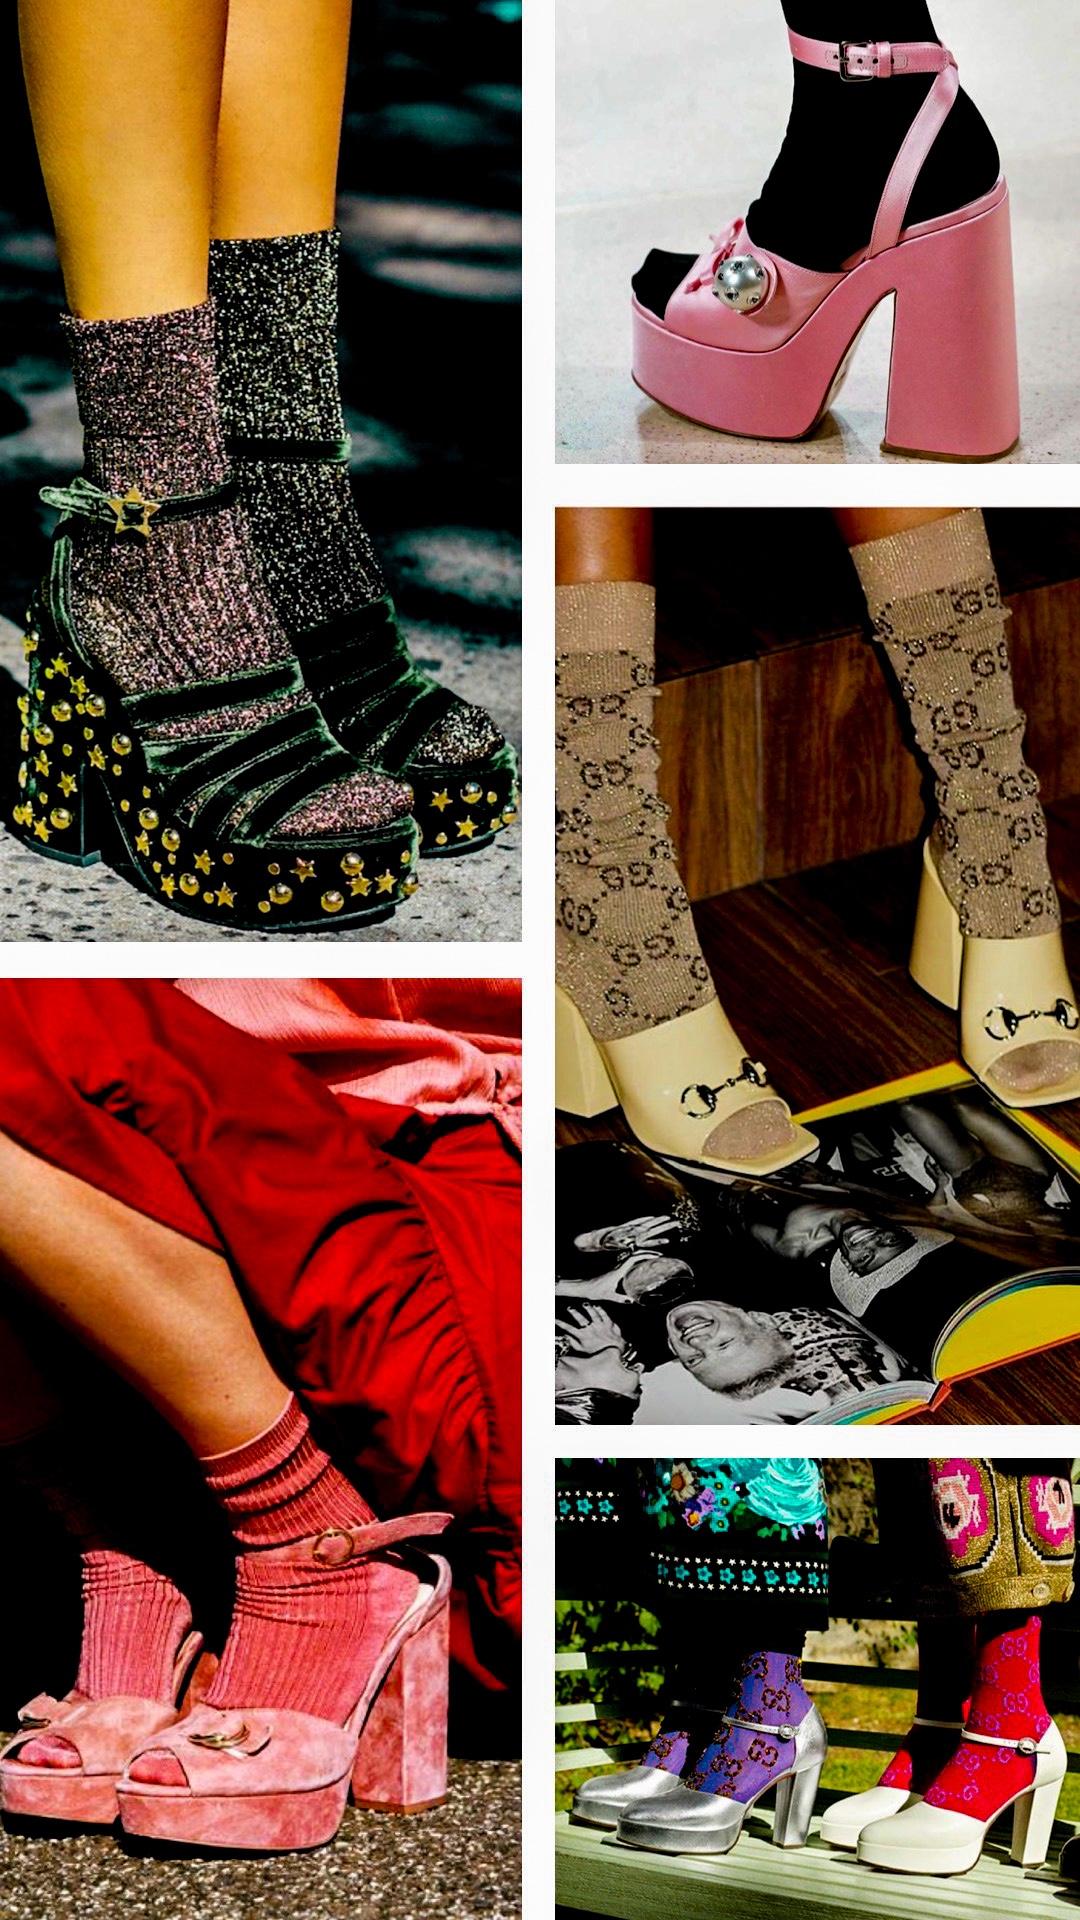 Gucci socks and heels